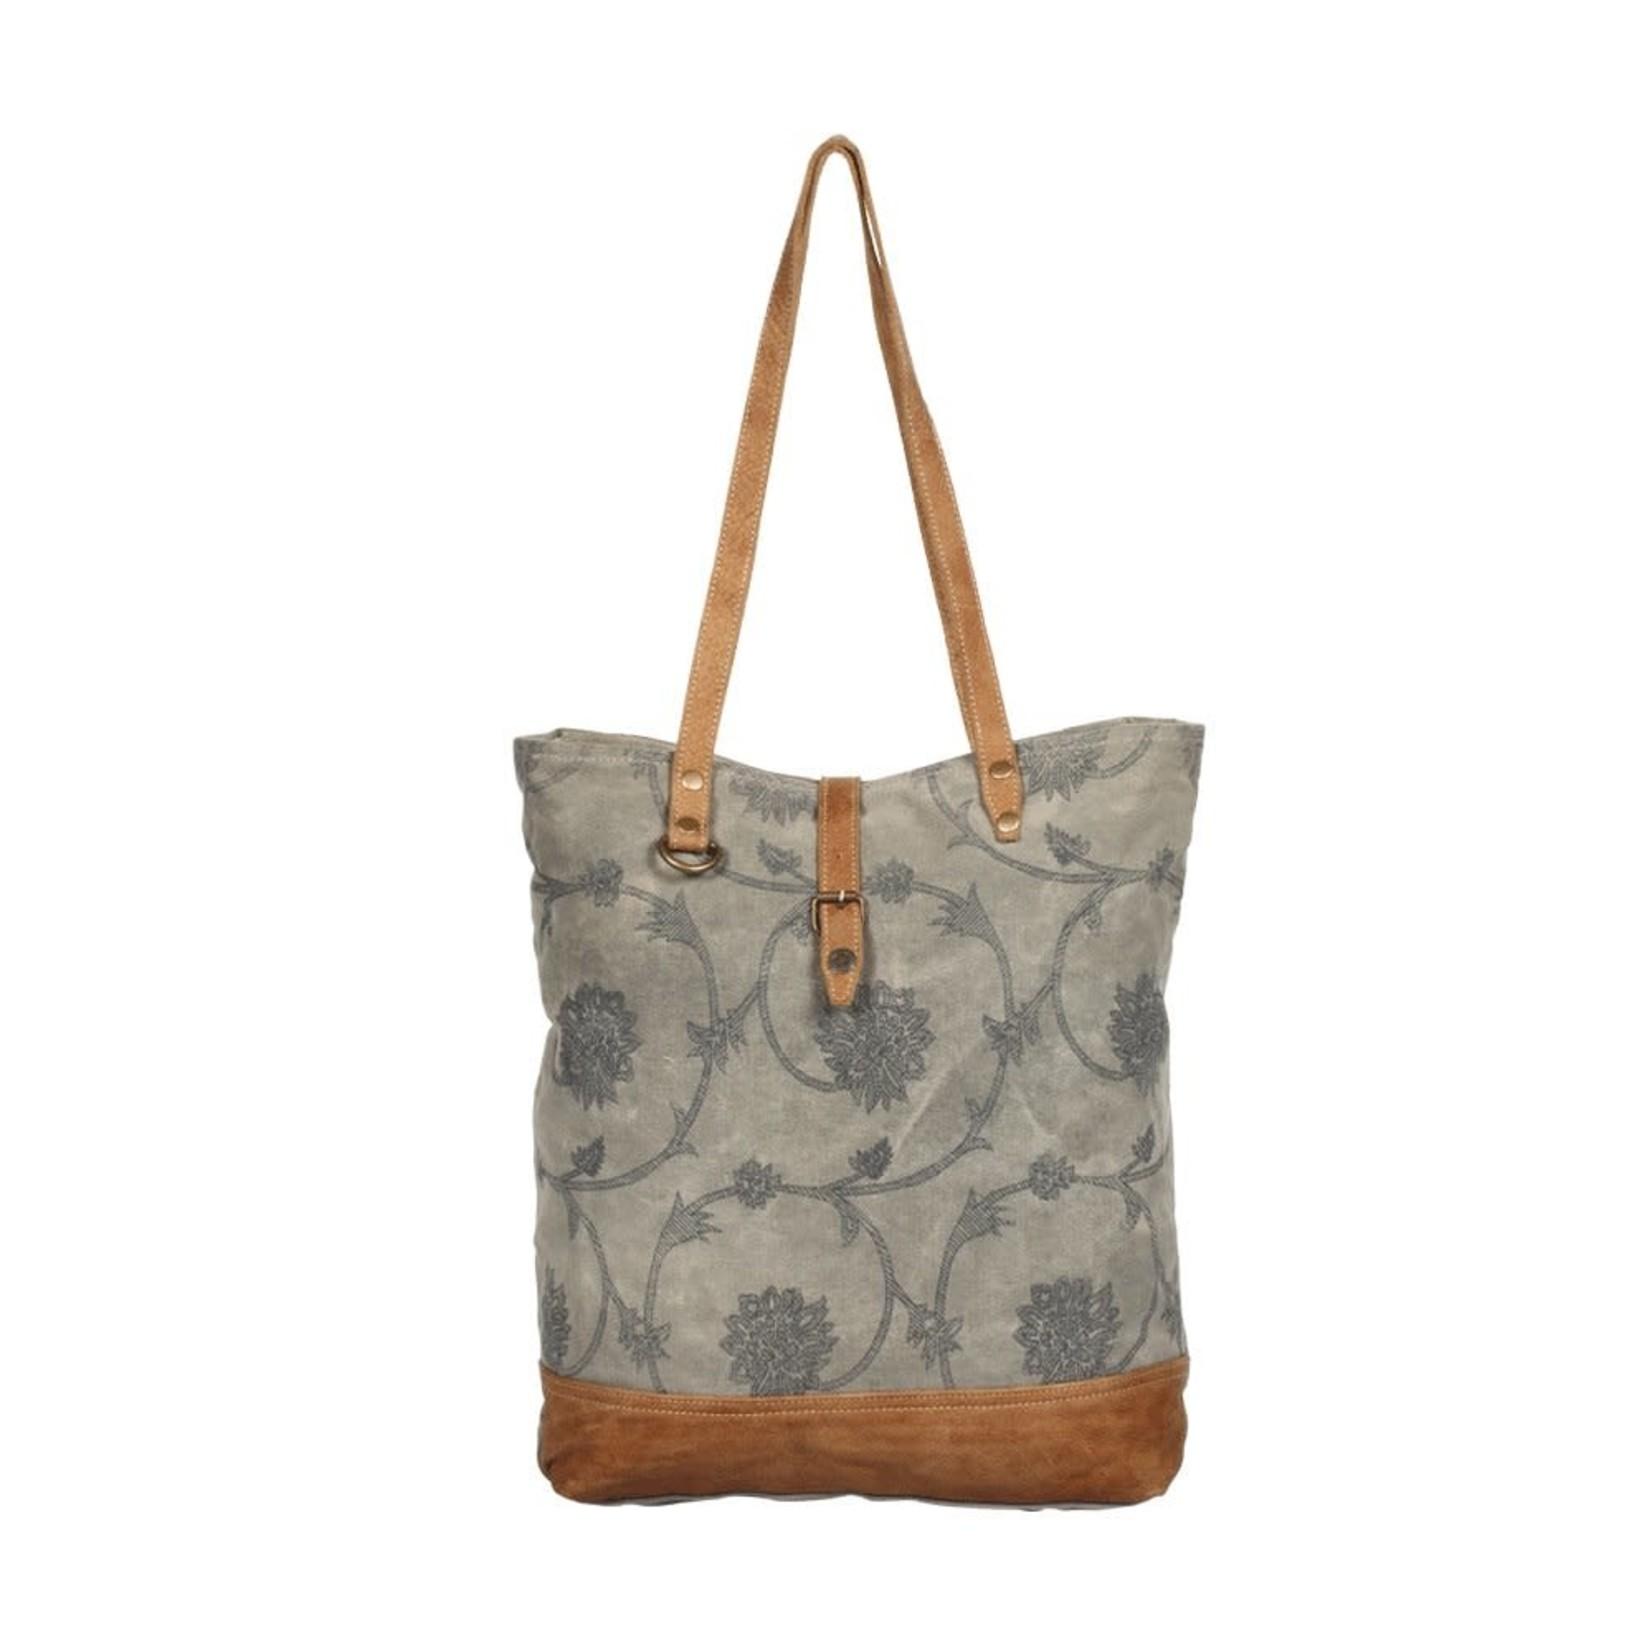 Myra Bags S-1356 Splendiferous Tote Bag